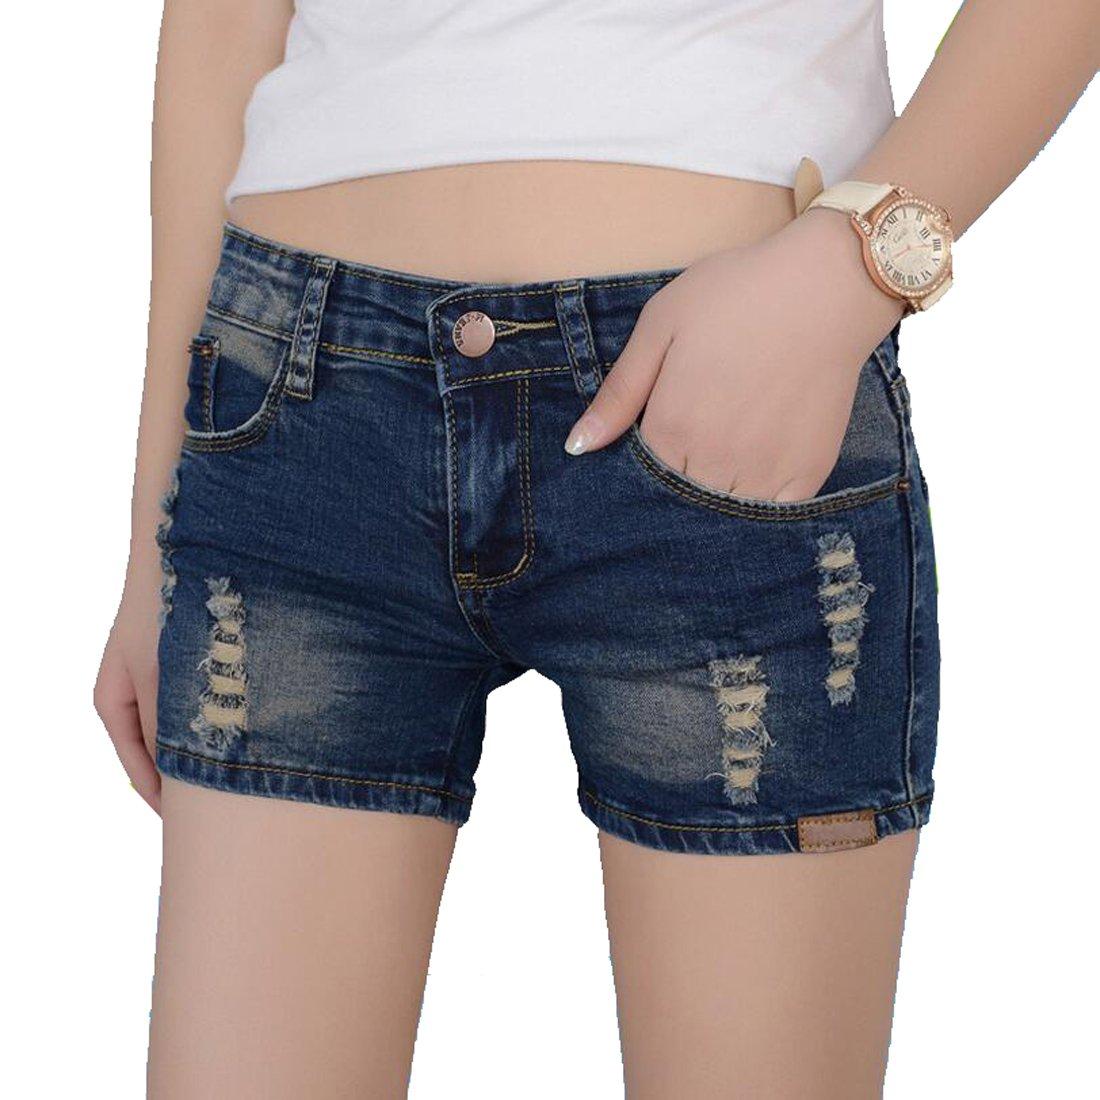 Women's Pocket Denim Shorts Juniors Washed Street Jeans